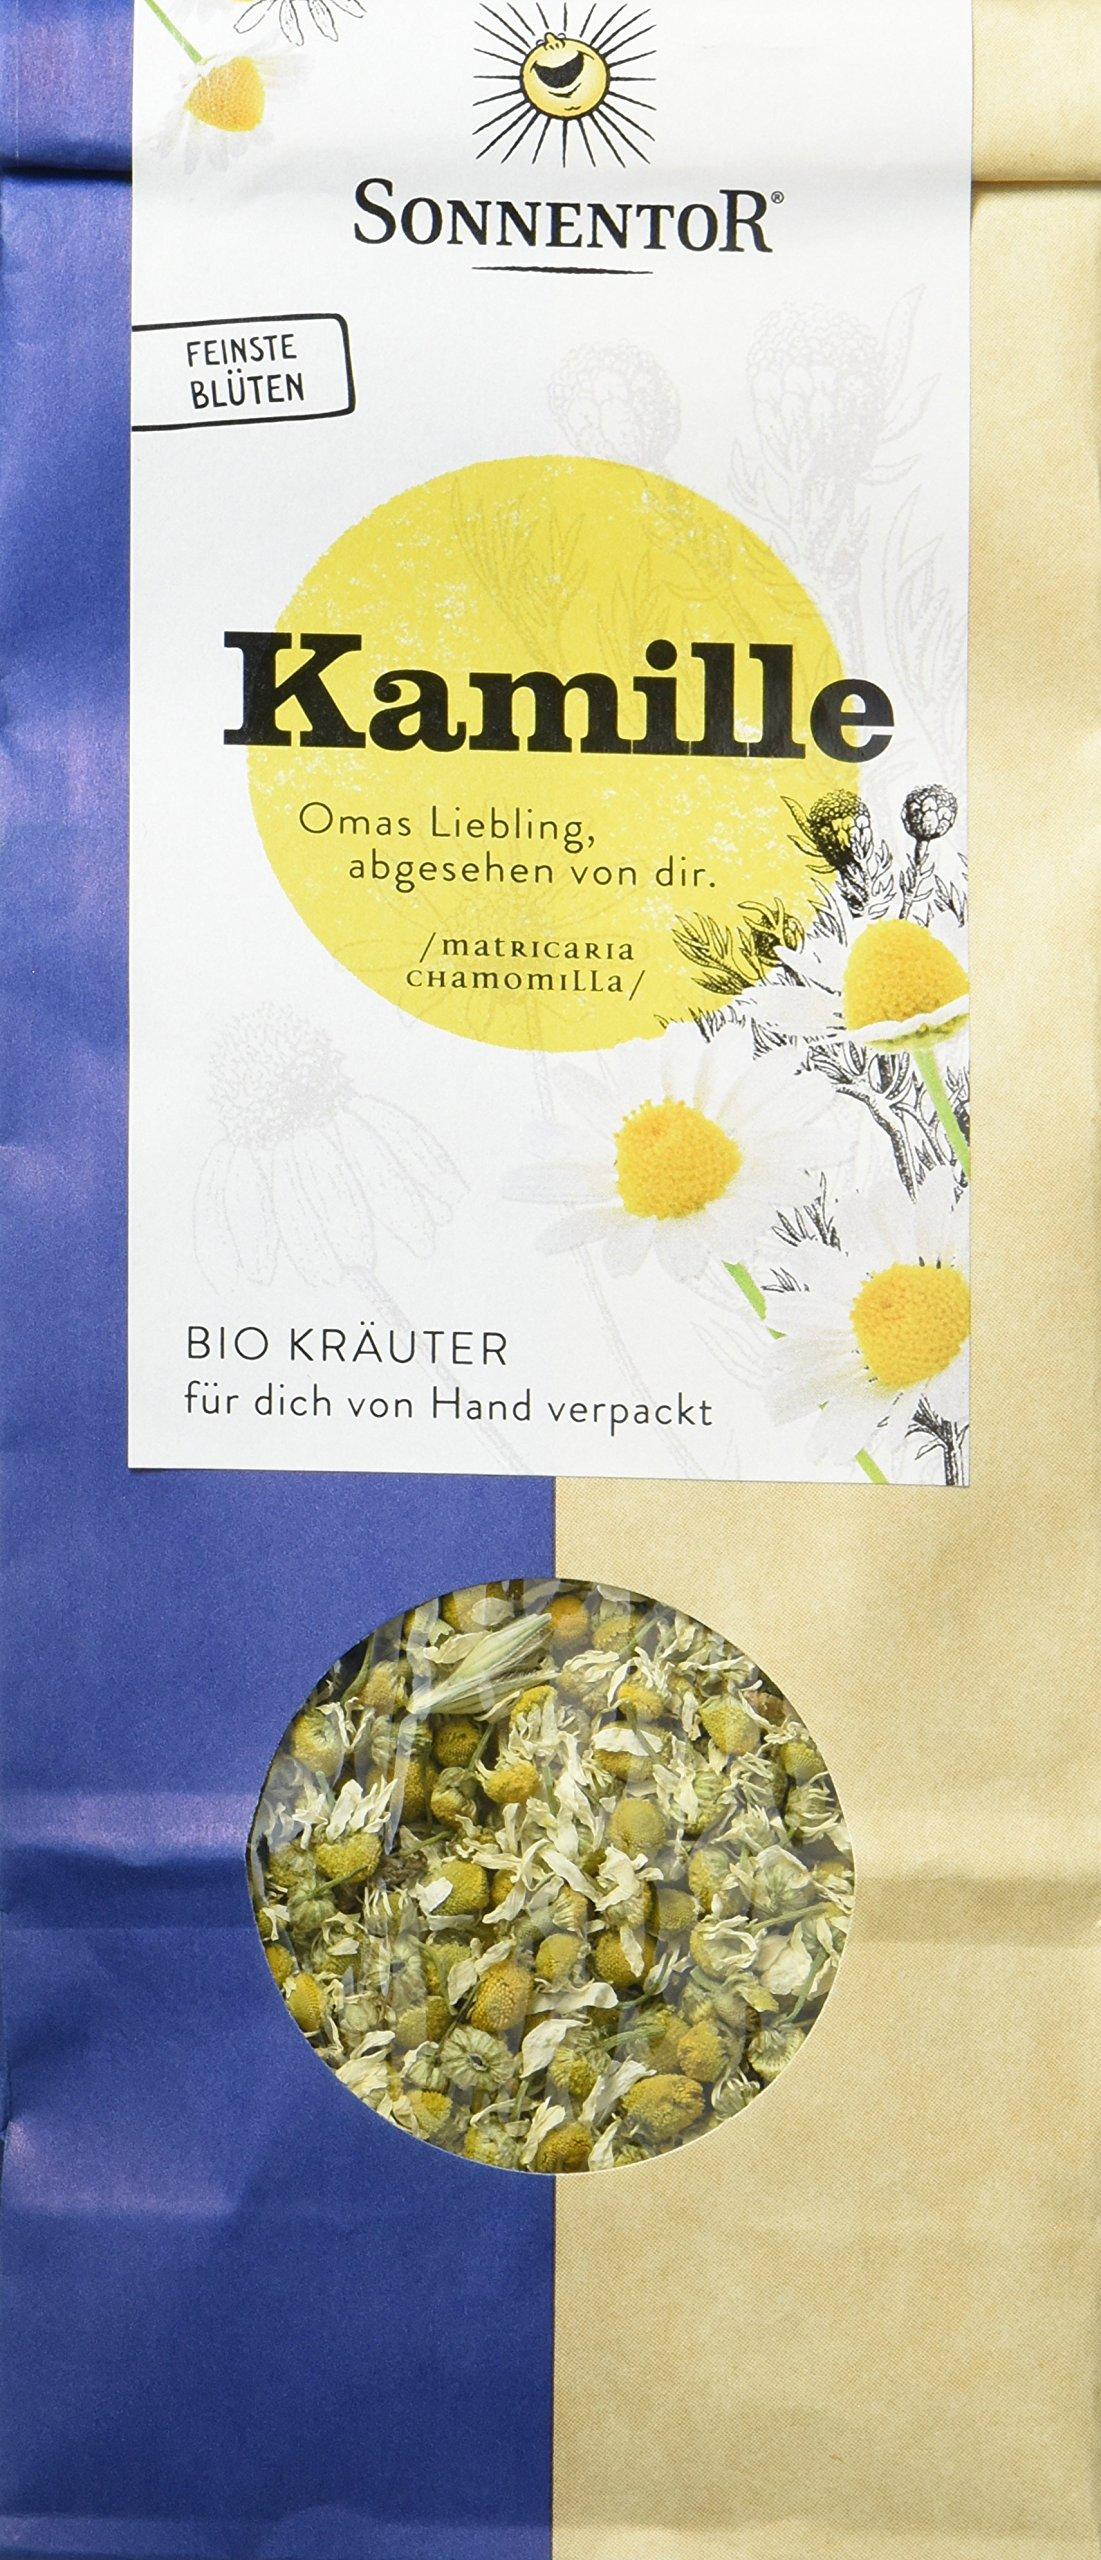 Sonnentor-Tee-Kamille-lose-1er-Pack-1-x-50-g-Bio